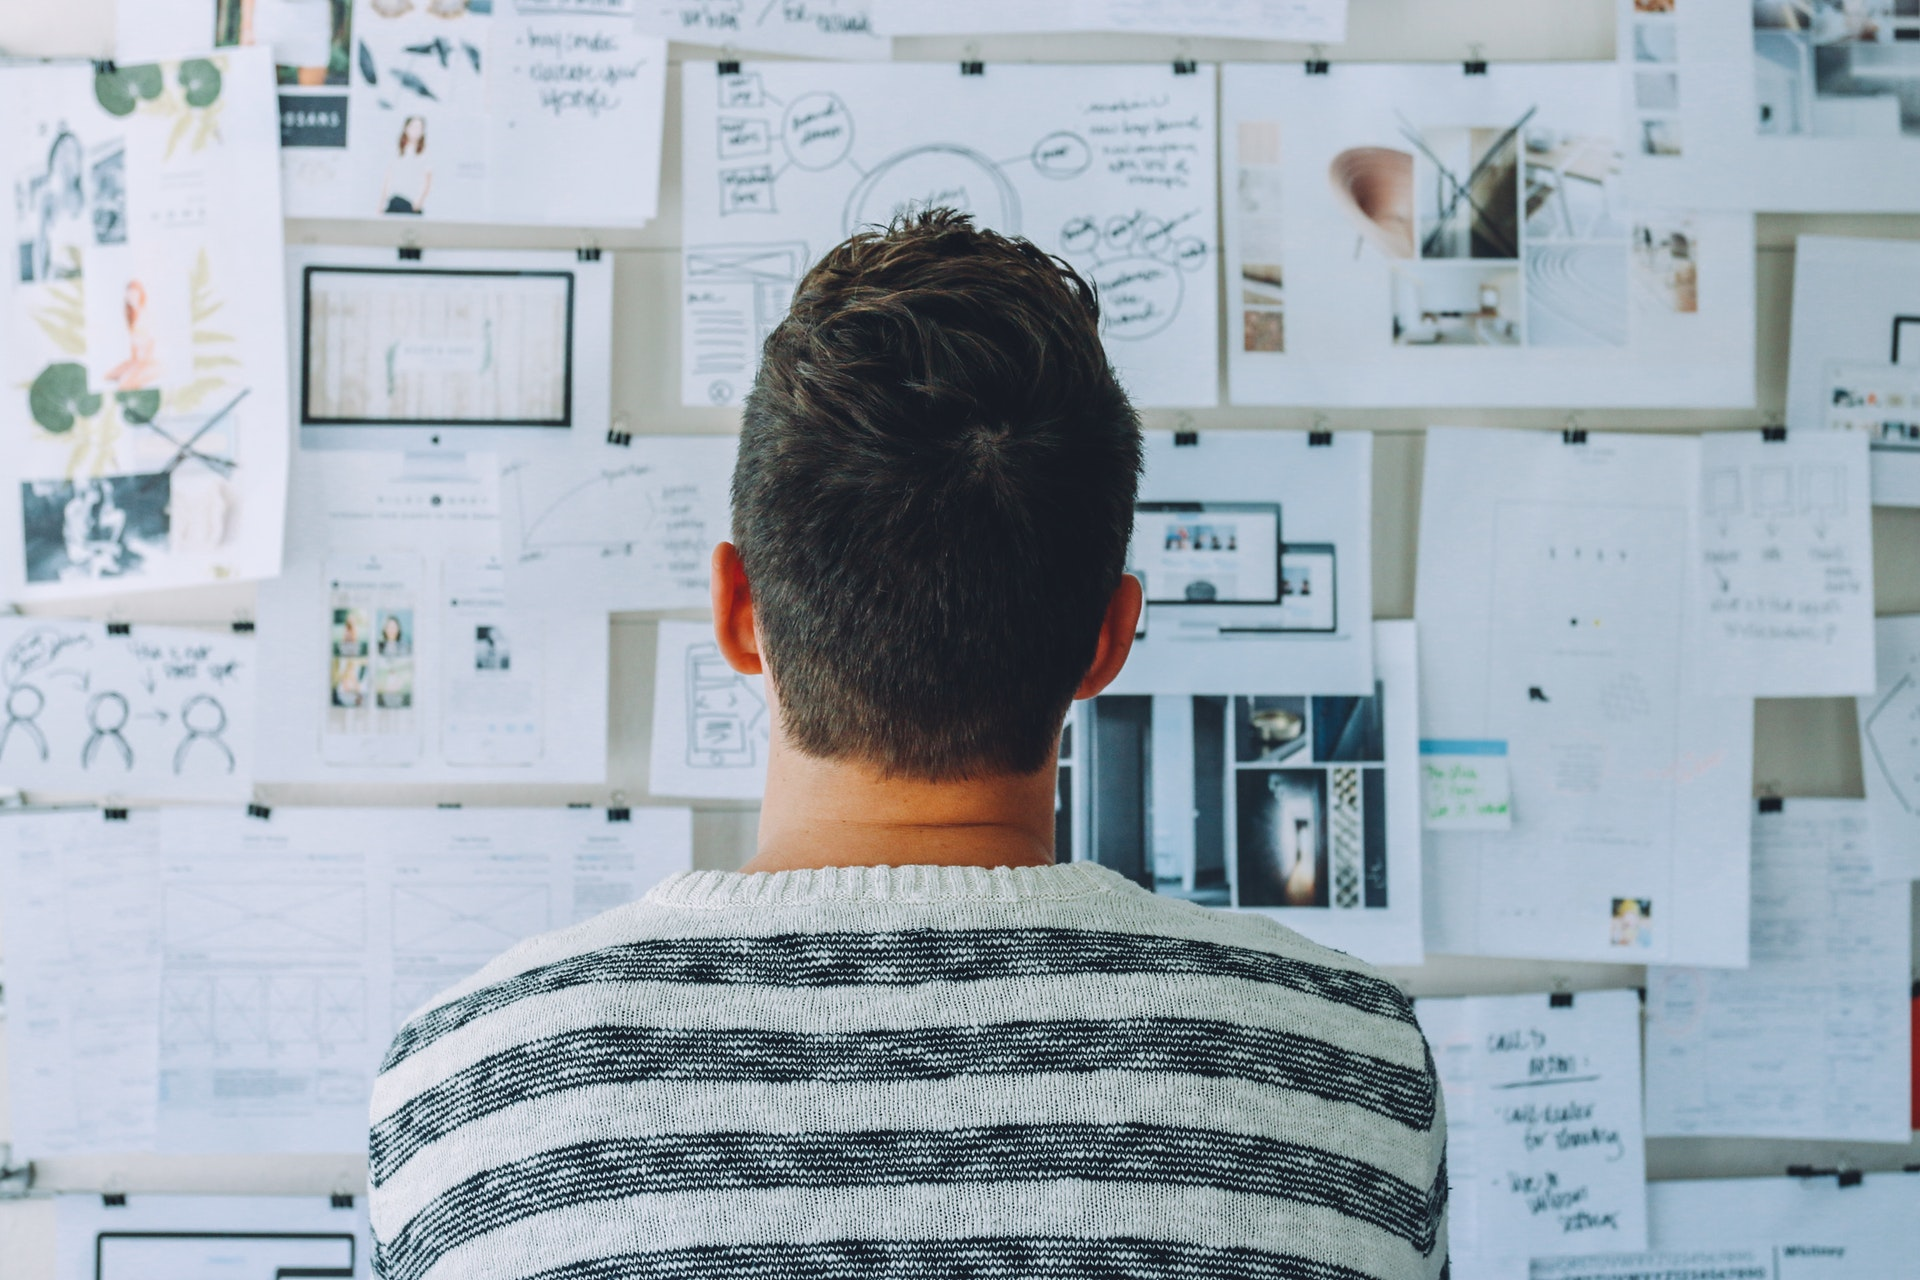 Gut Feel vs Data-driven decisions